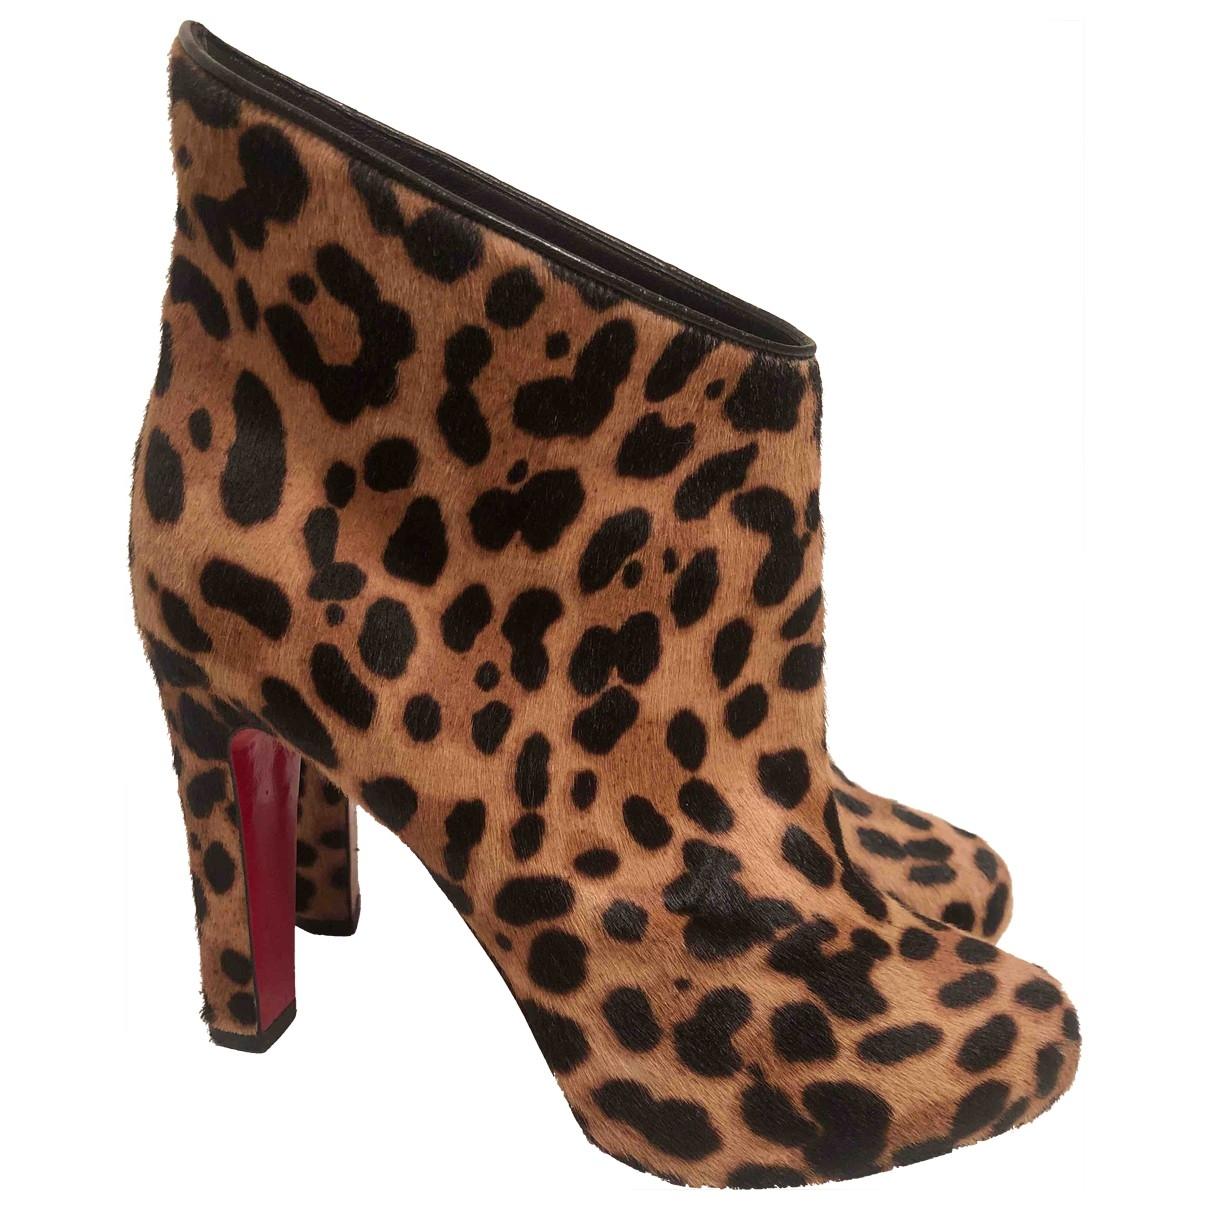 Christian Louboutin Suzy Folk Beige Pony-style calfskin Ankle boots for Women 37 EU